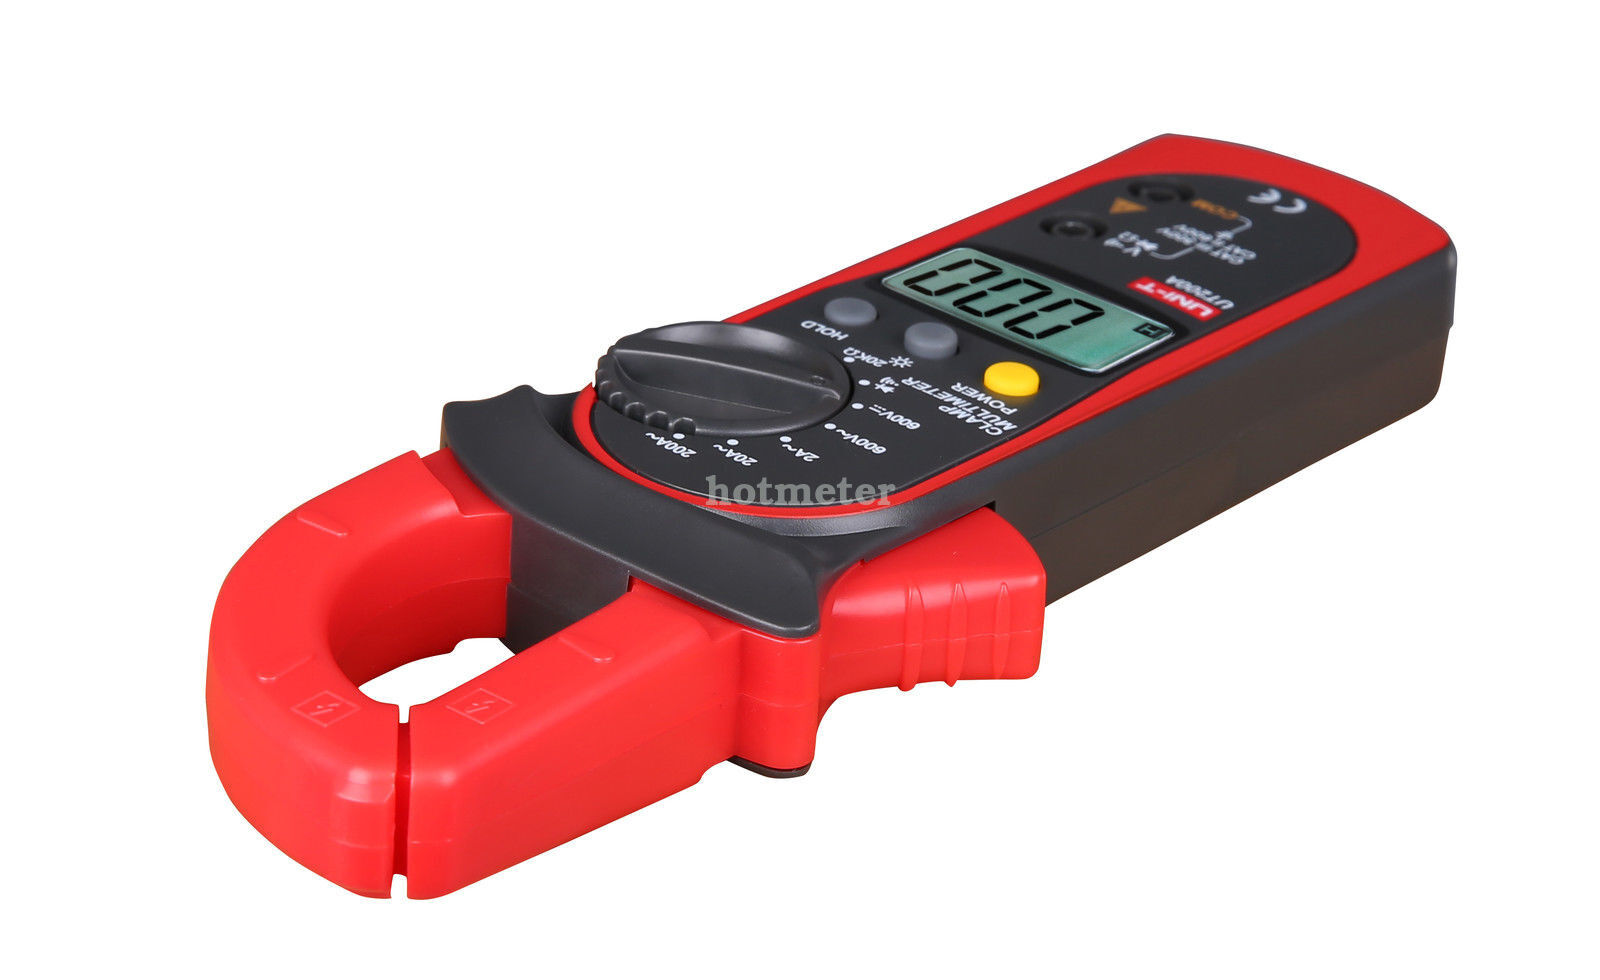 Uni T Ut200a Modern Digital Clamp Multimete Ac Dc Amp Volt Resistance Tester Electronics Mercury Multimeter Circuit Mtm01 Ebay